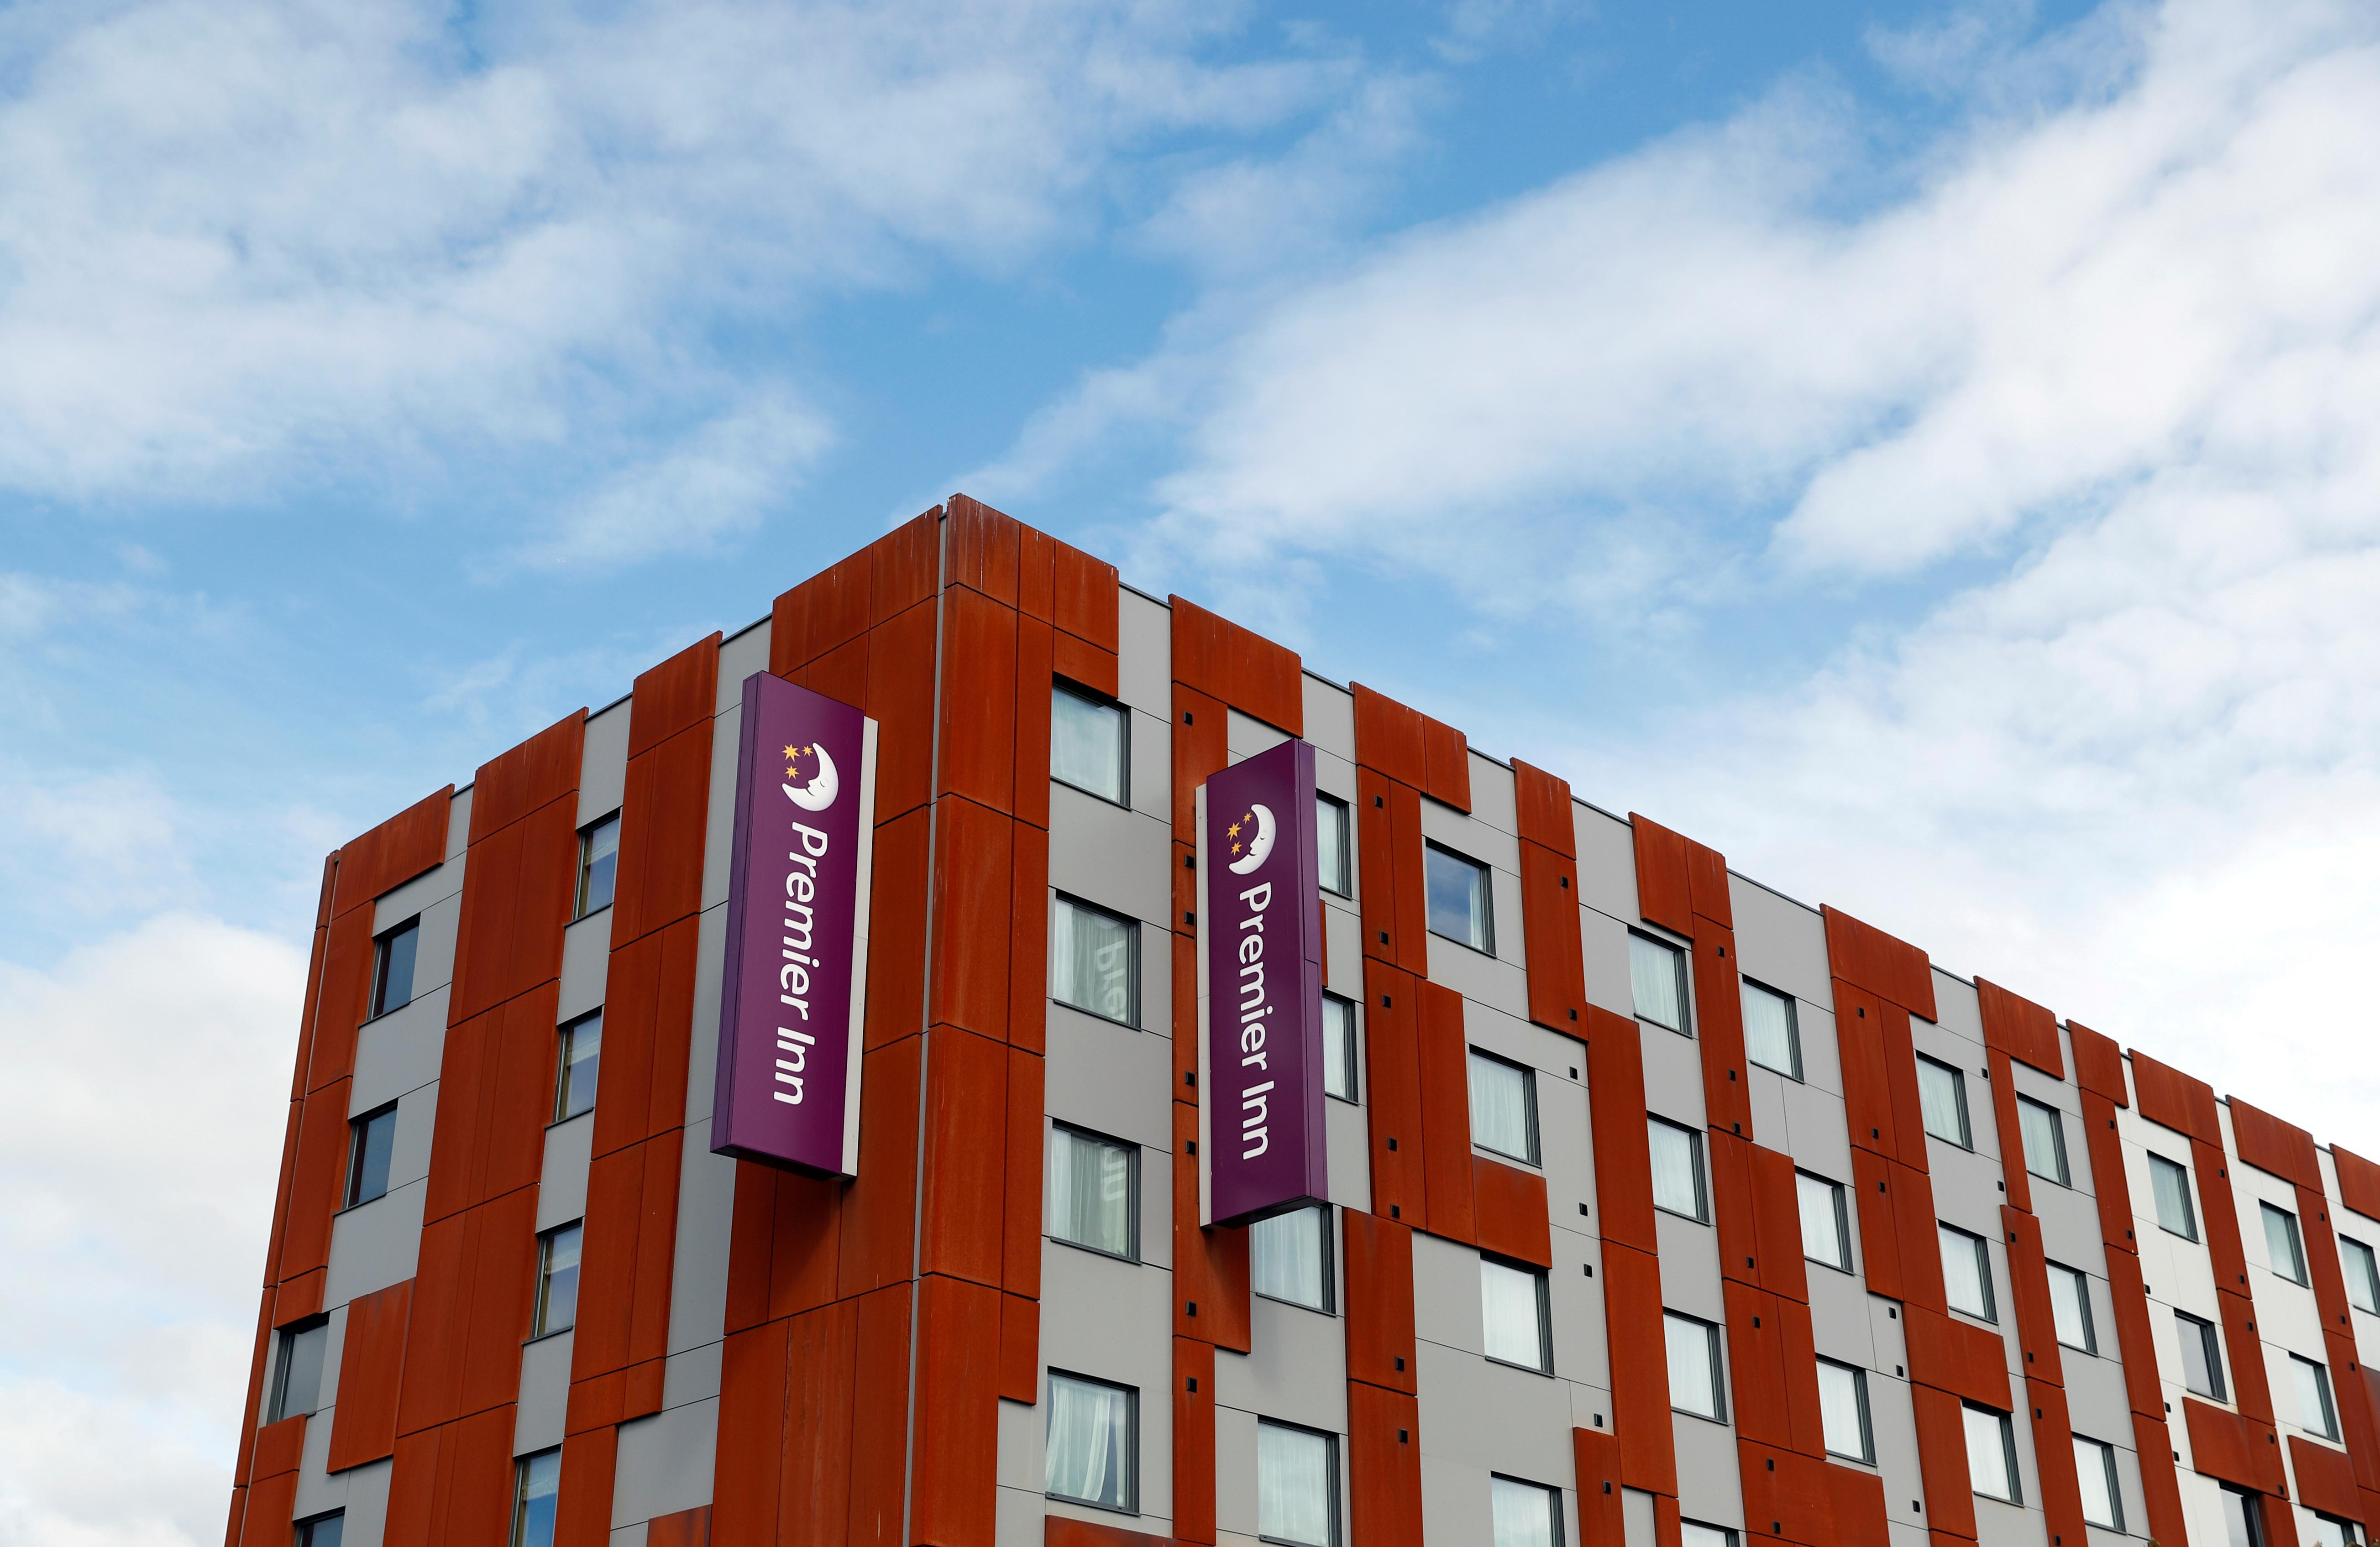 A Premier Inn hotel is pictured in Milton Keynes, Britain September 25, 2020. REUTERS/Andrew Boyers